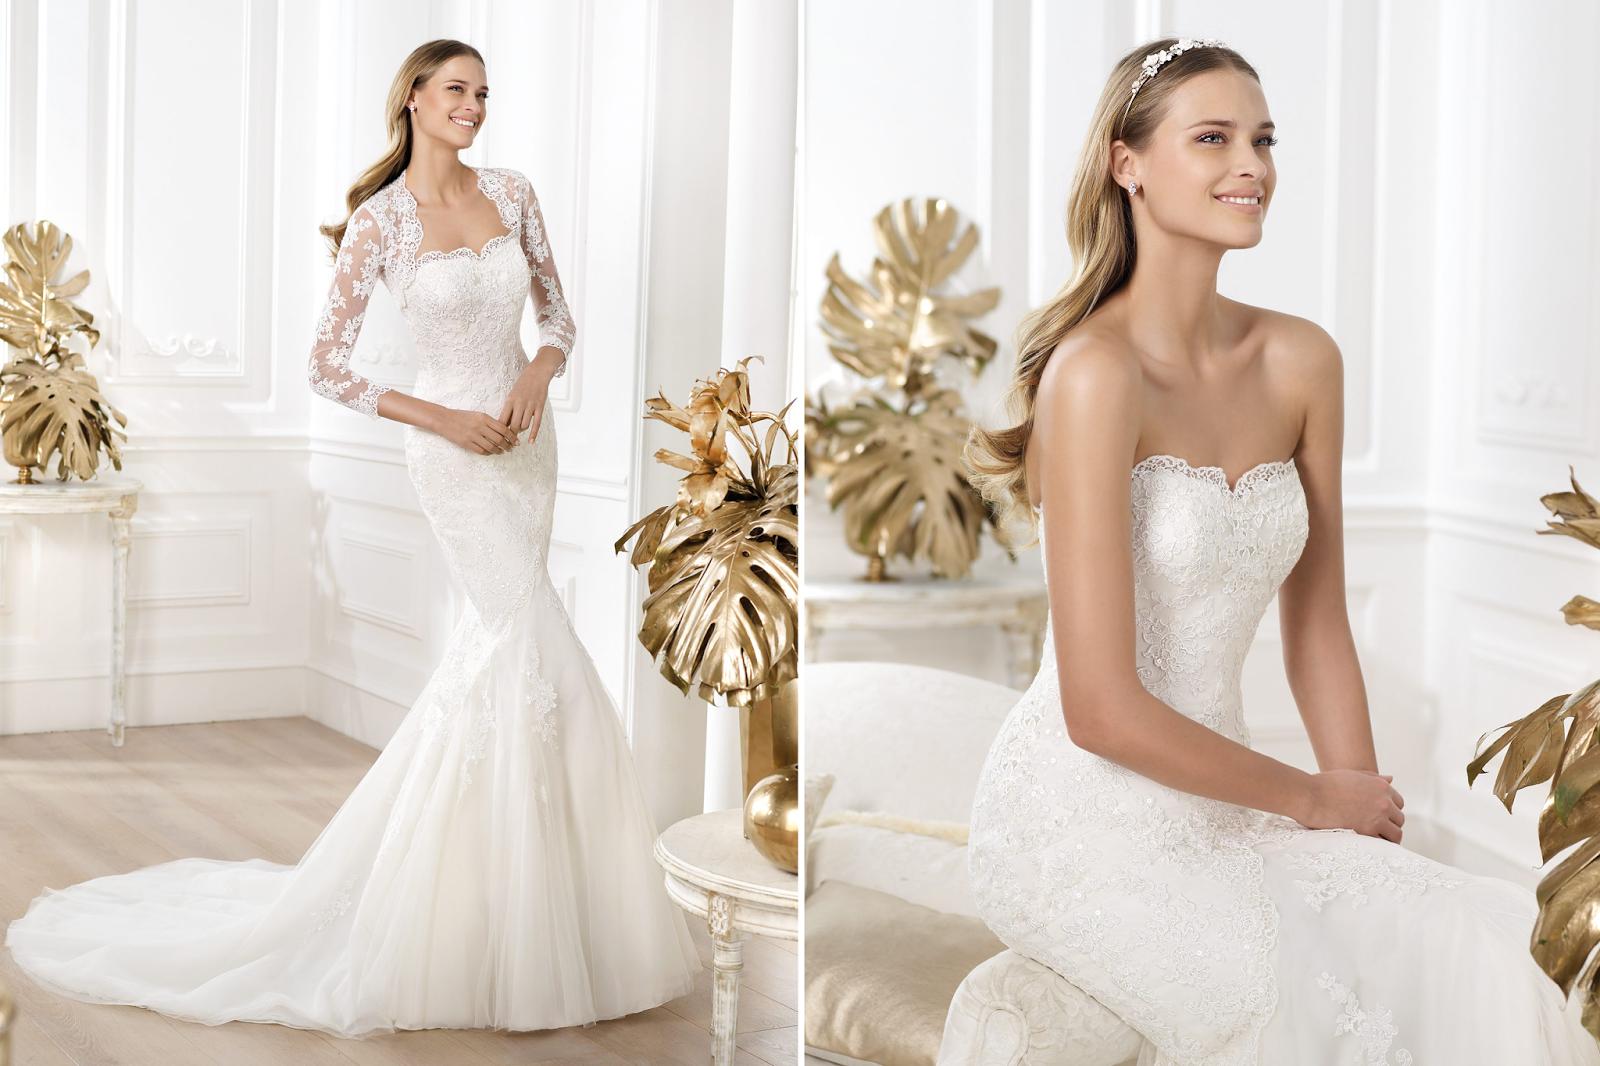 Wedding Dress Lace Italian : Wedding collections lace dresses italian designers